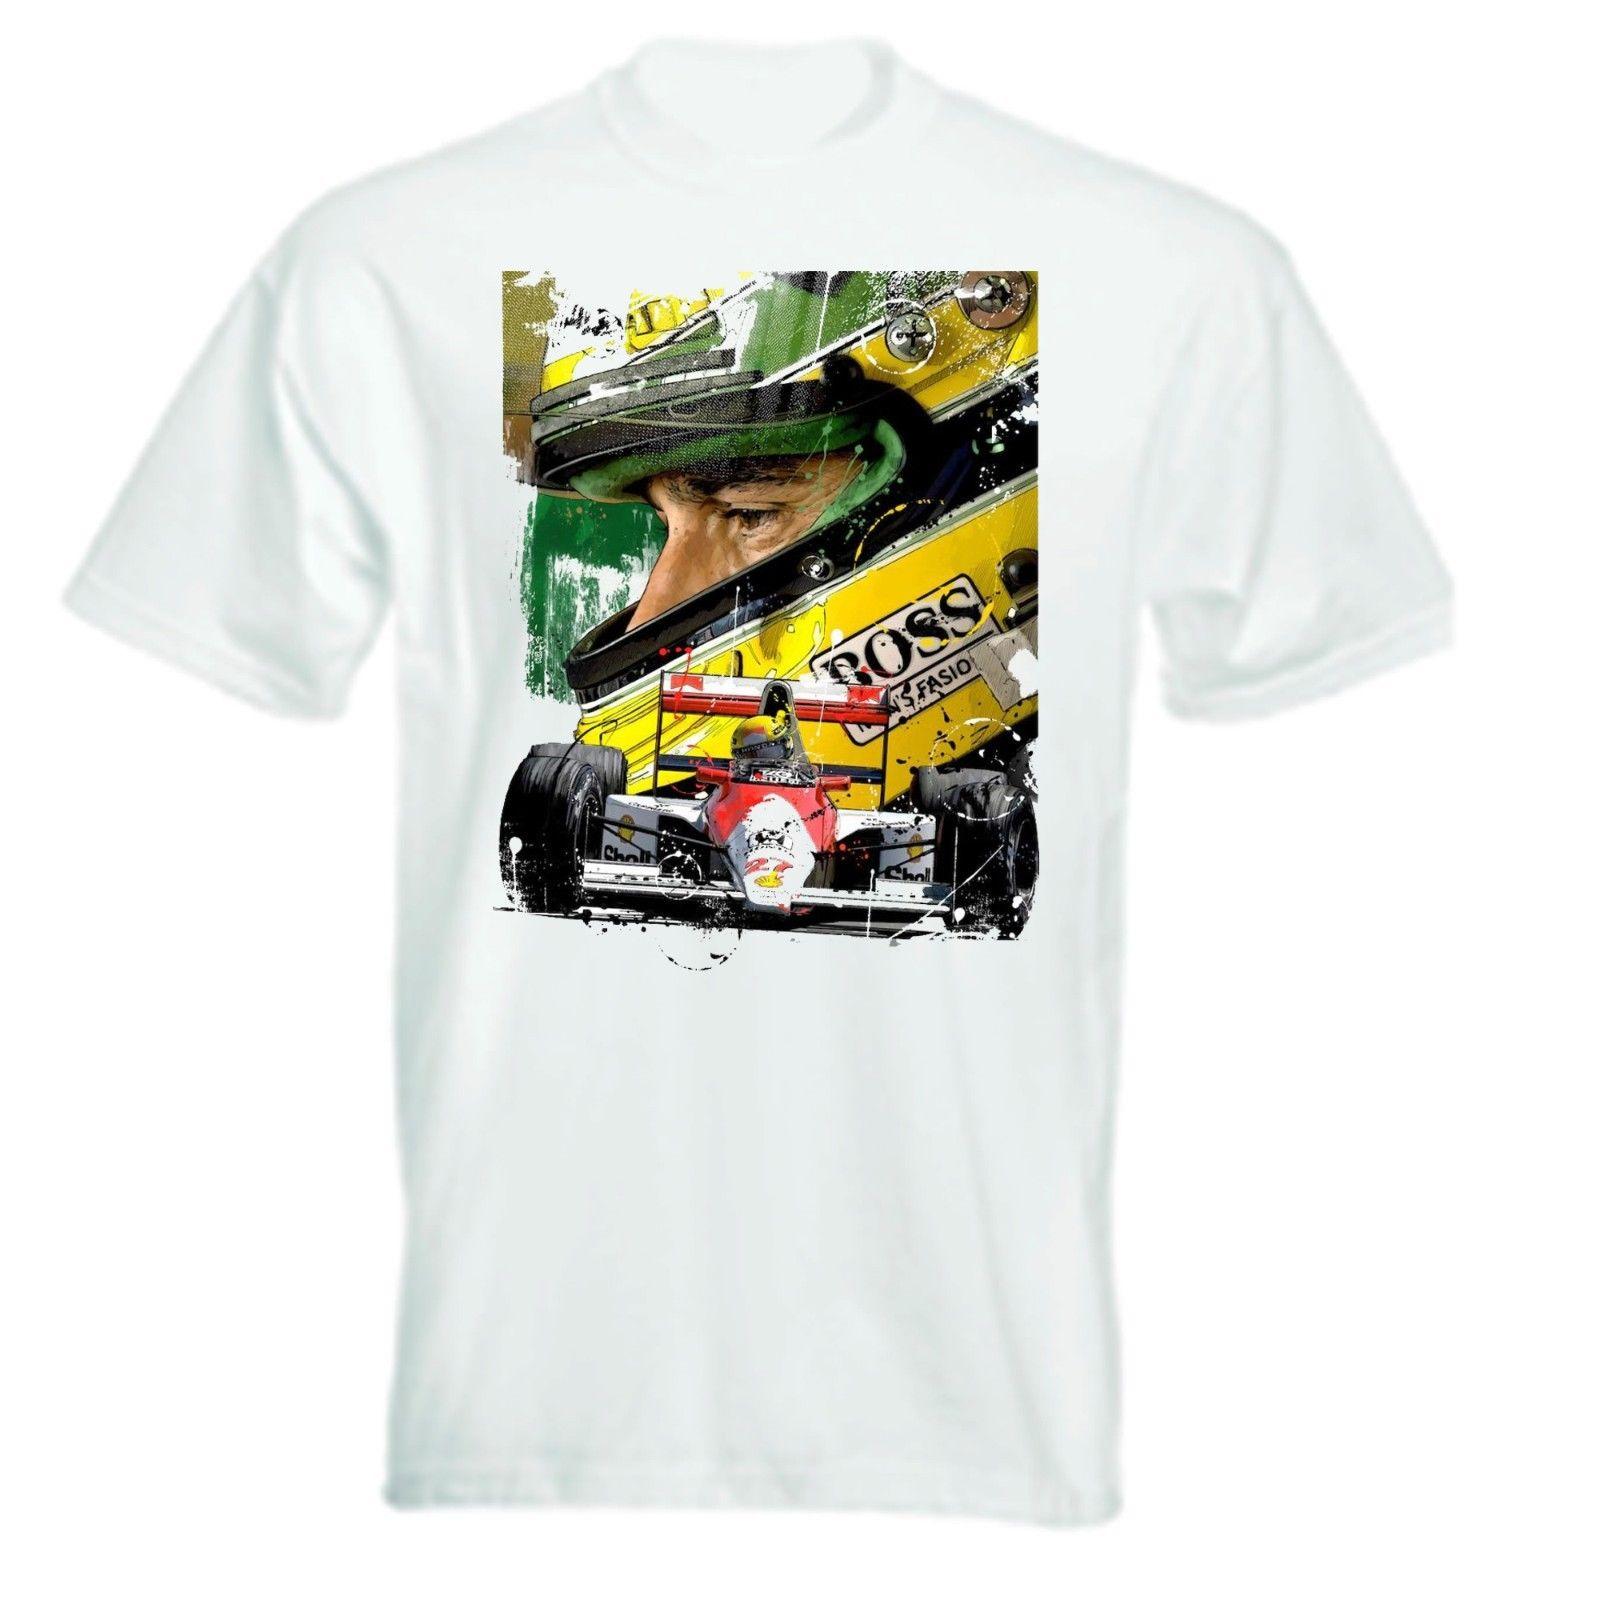 ayrton-font-b-senna-b-font-artwork-t-shirt-cool-casual-pride-t-shirt-men-unisex-new-fashion-tshirt-loose-size-top-ajax